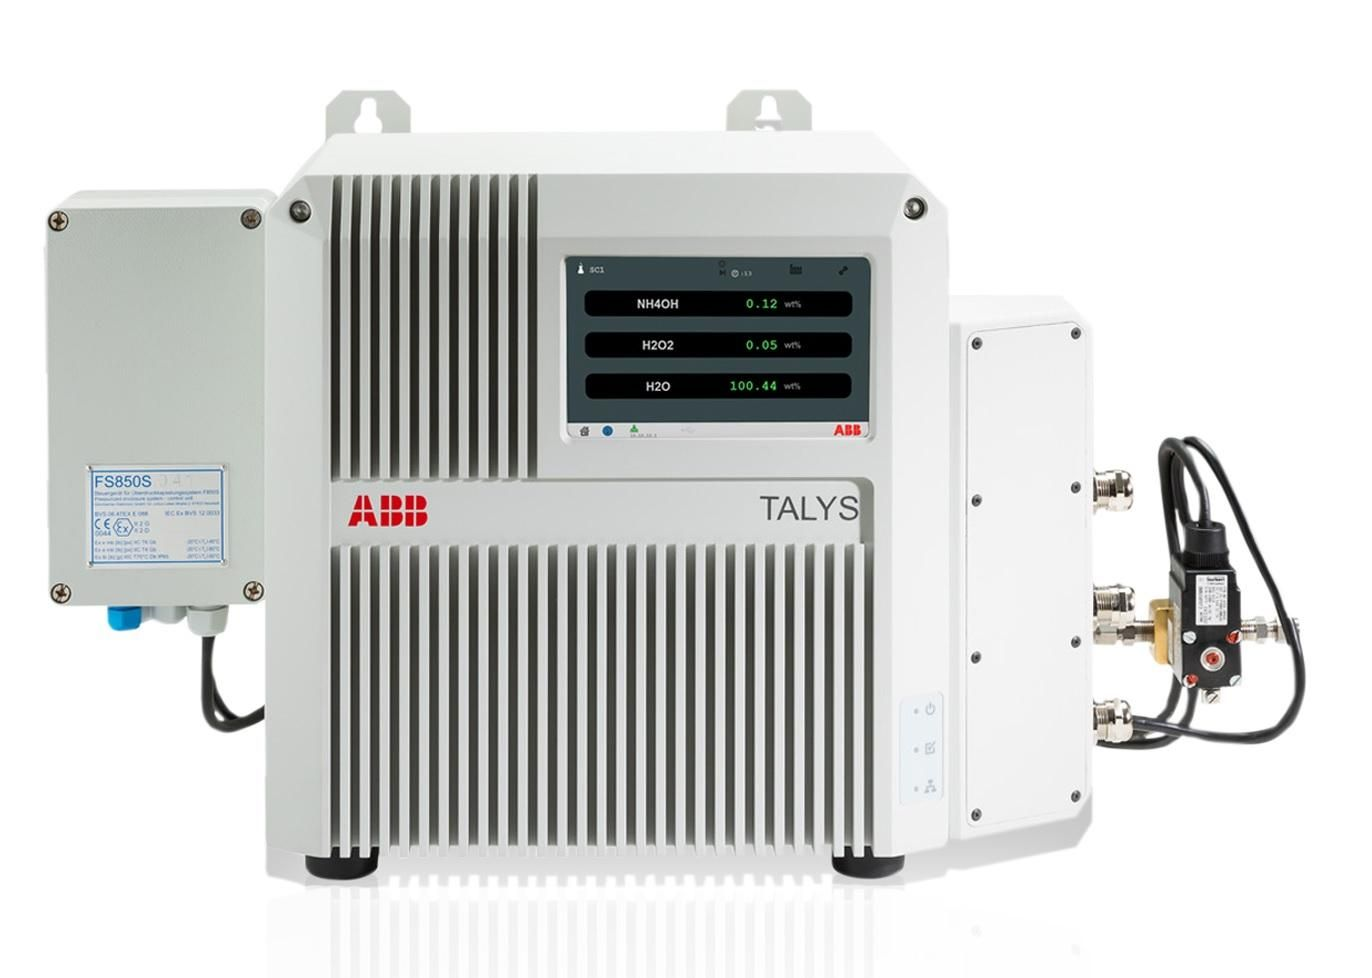 TALYS ASP400 Series FT-NIR Analyzer